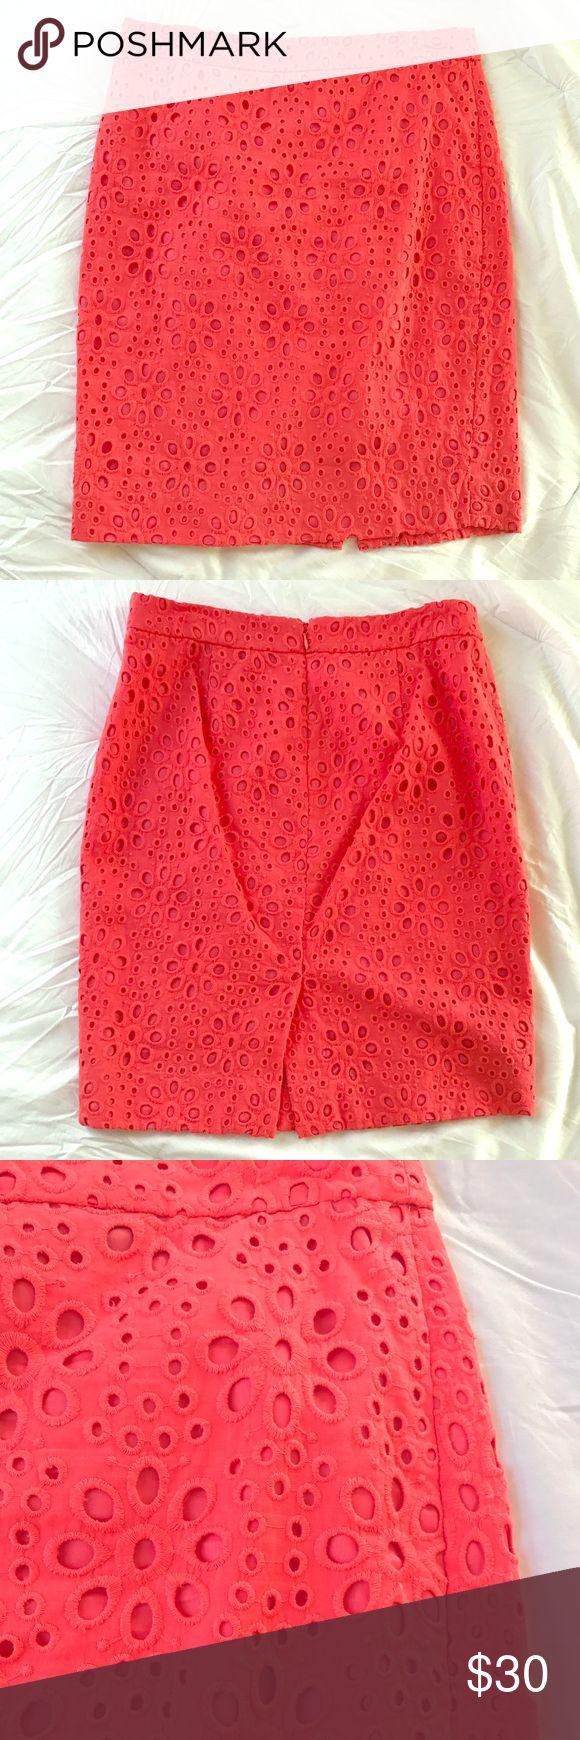 Selling this J. Crew coral pencil skirt on Poshmark! My username is: meganlaures. #shopmycloset #poshmark #fashion #shopping #style #forsale #J. Crew #Dresses & Skirts